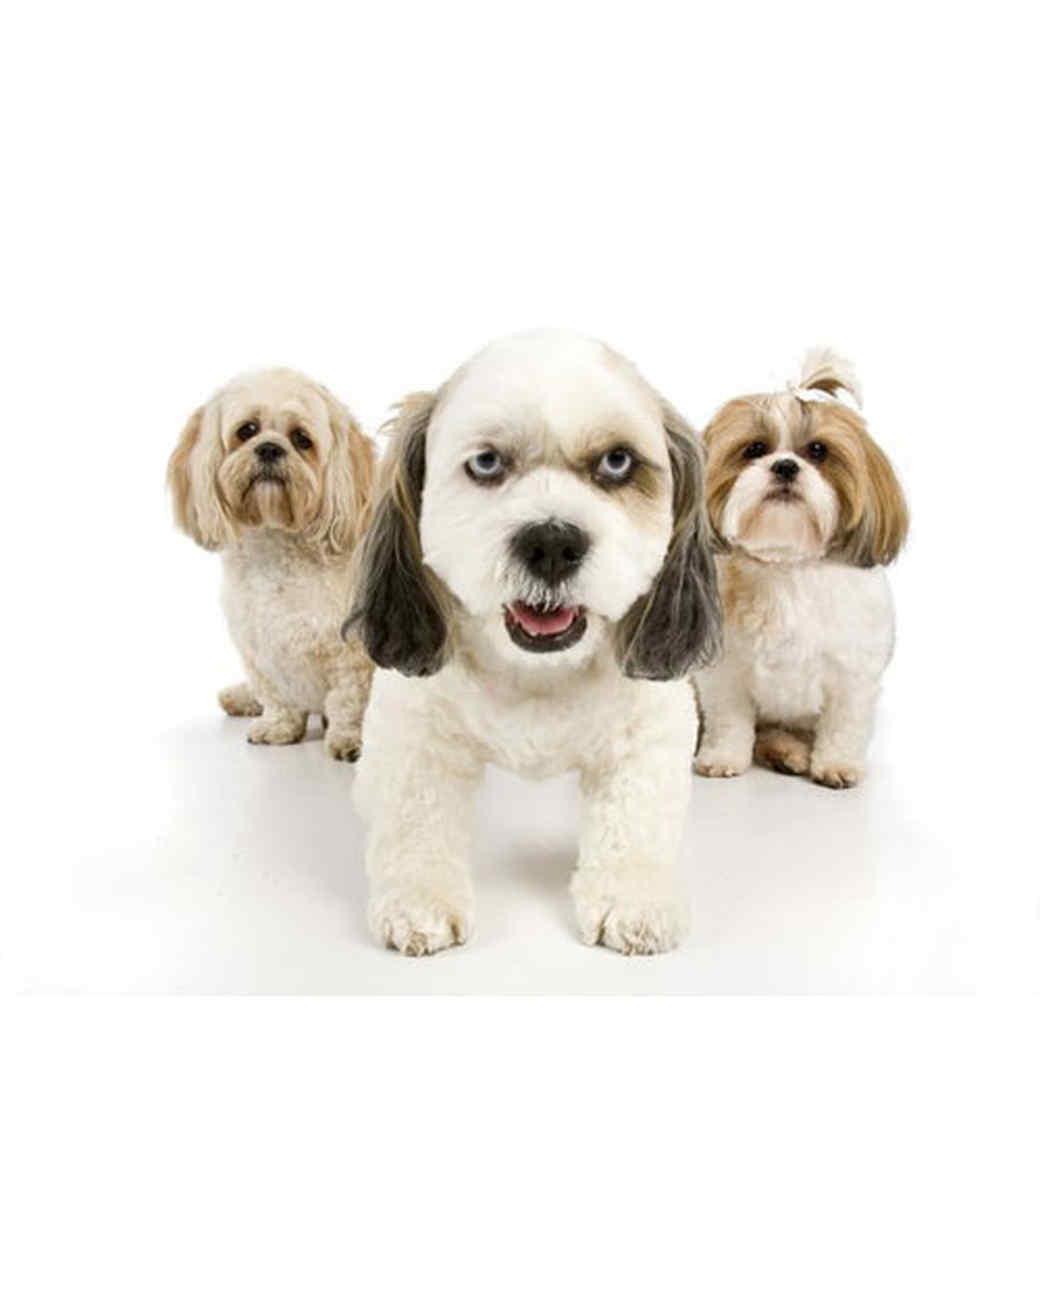 pets-13664365-31533614.jpg